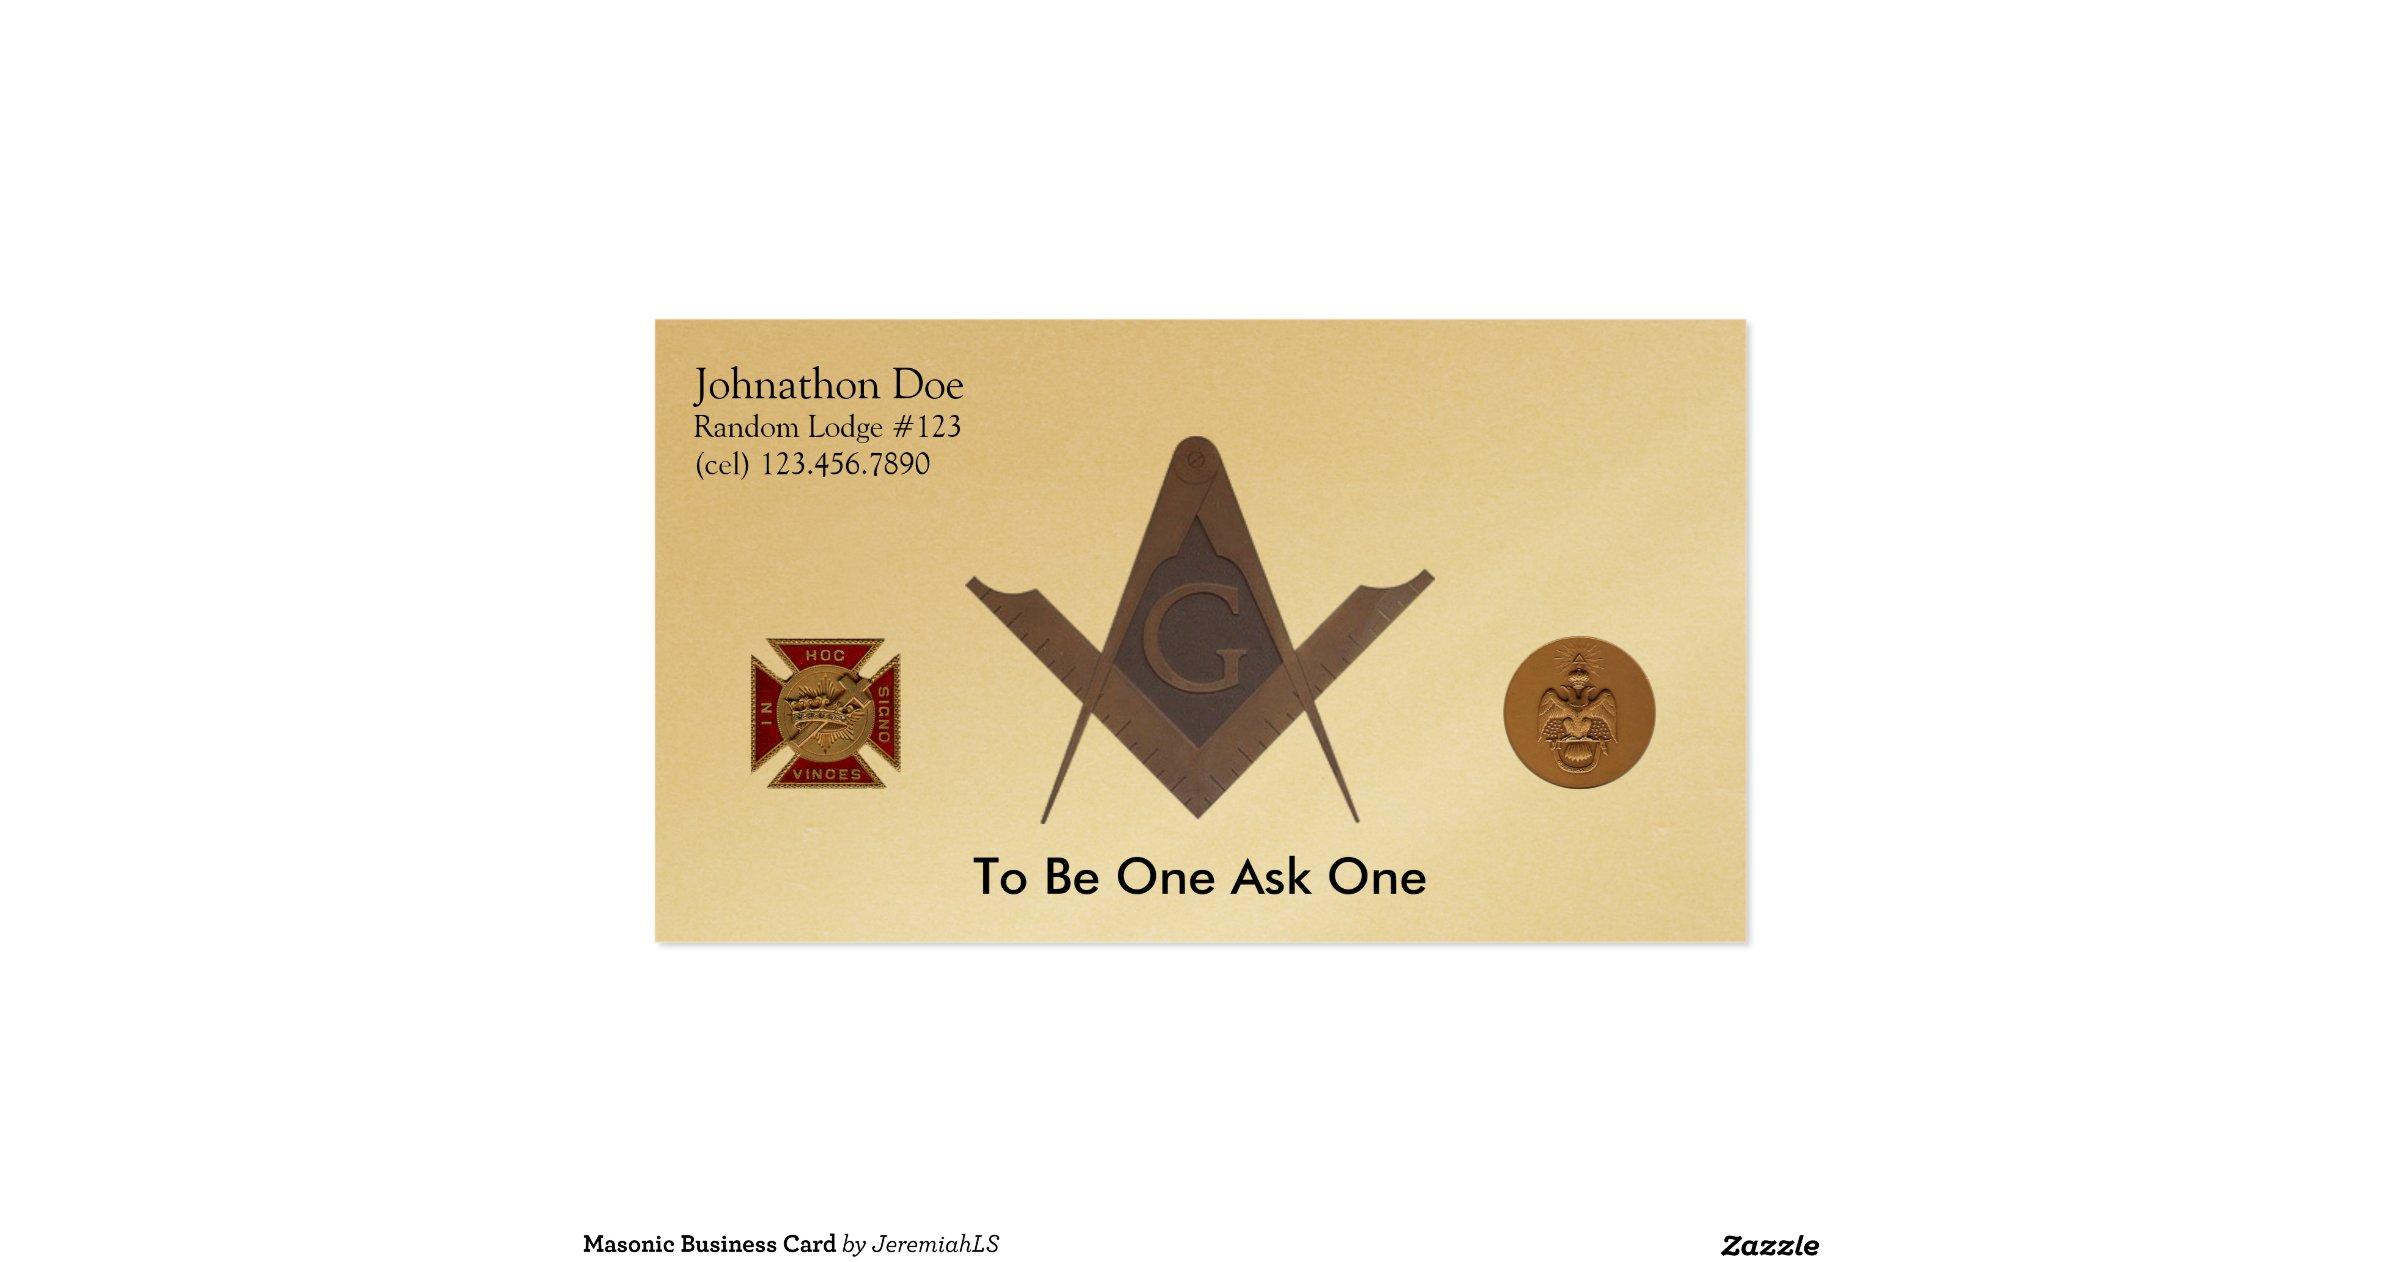 Masonic business card rbb872b359bd0431ab1ab43133c1407a9 for Freemason business cards